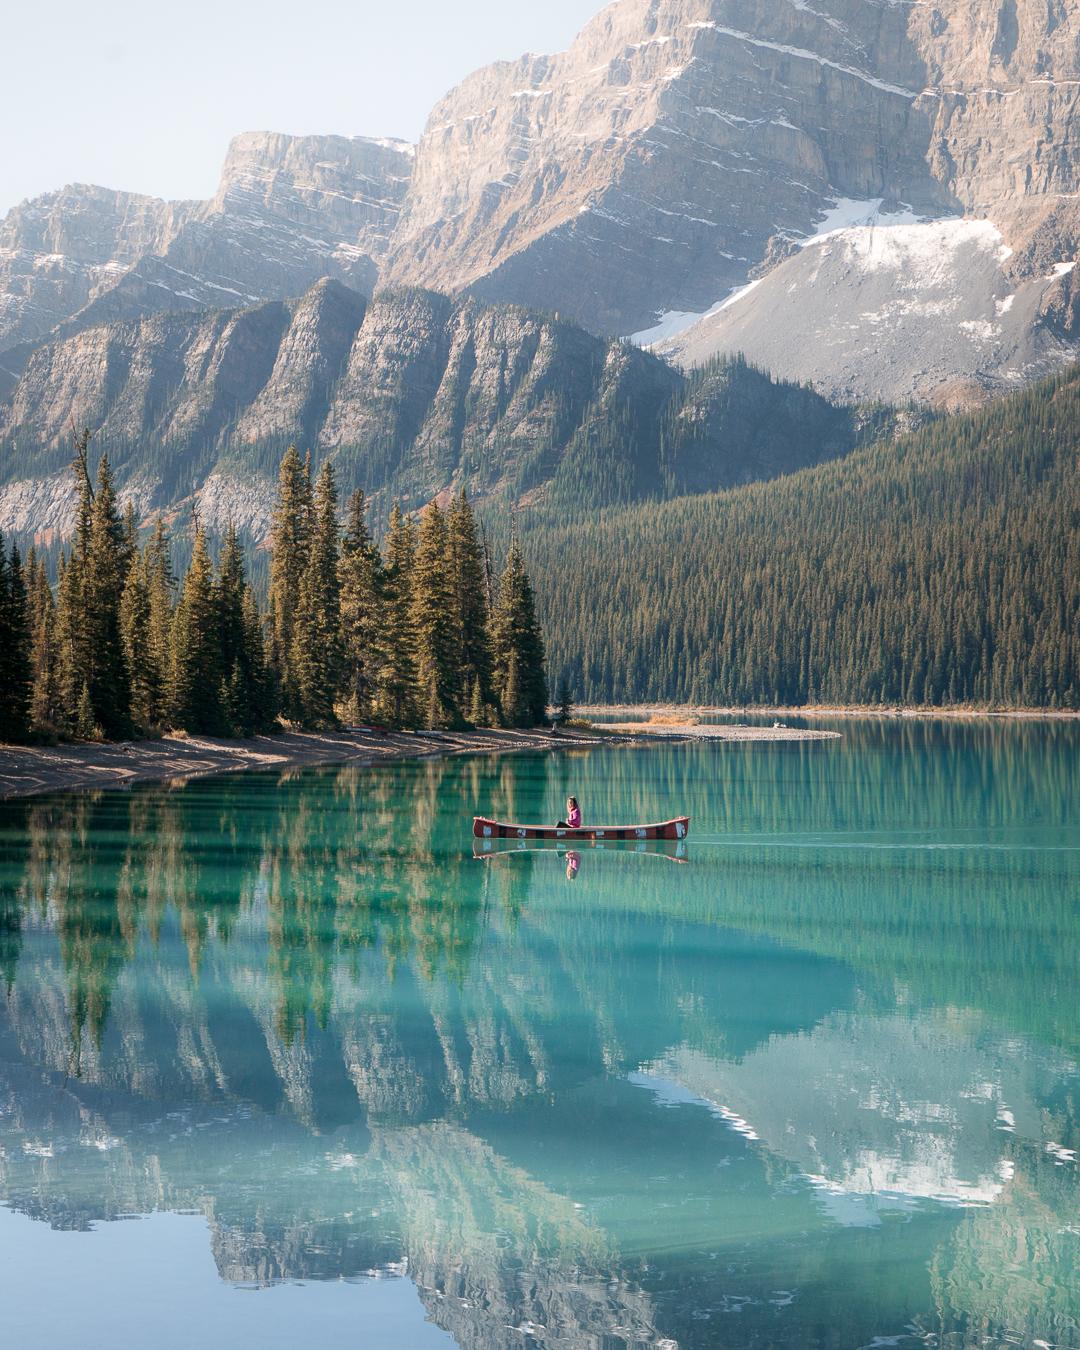 Canoeing on one of Banff's beautiful alpine lakes.